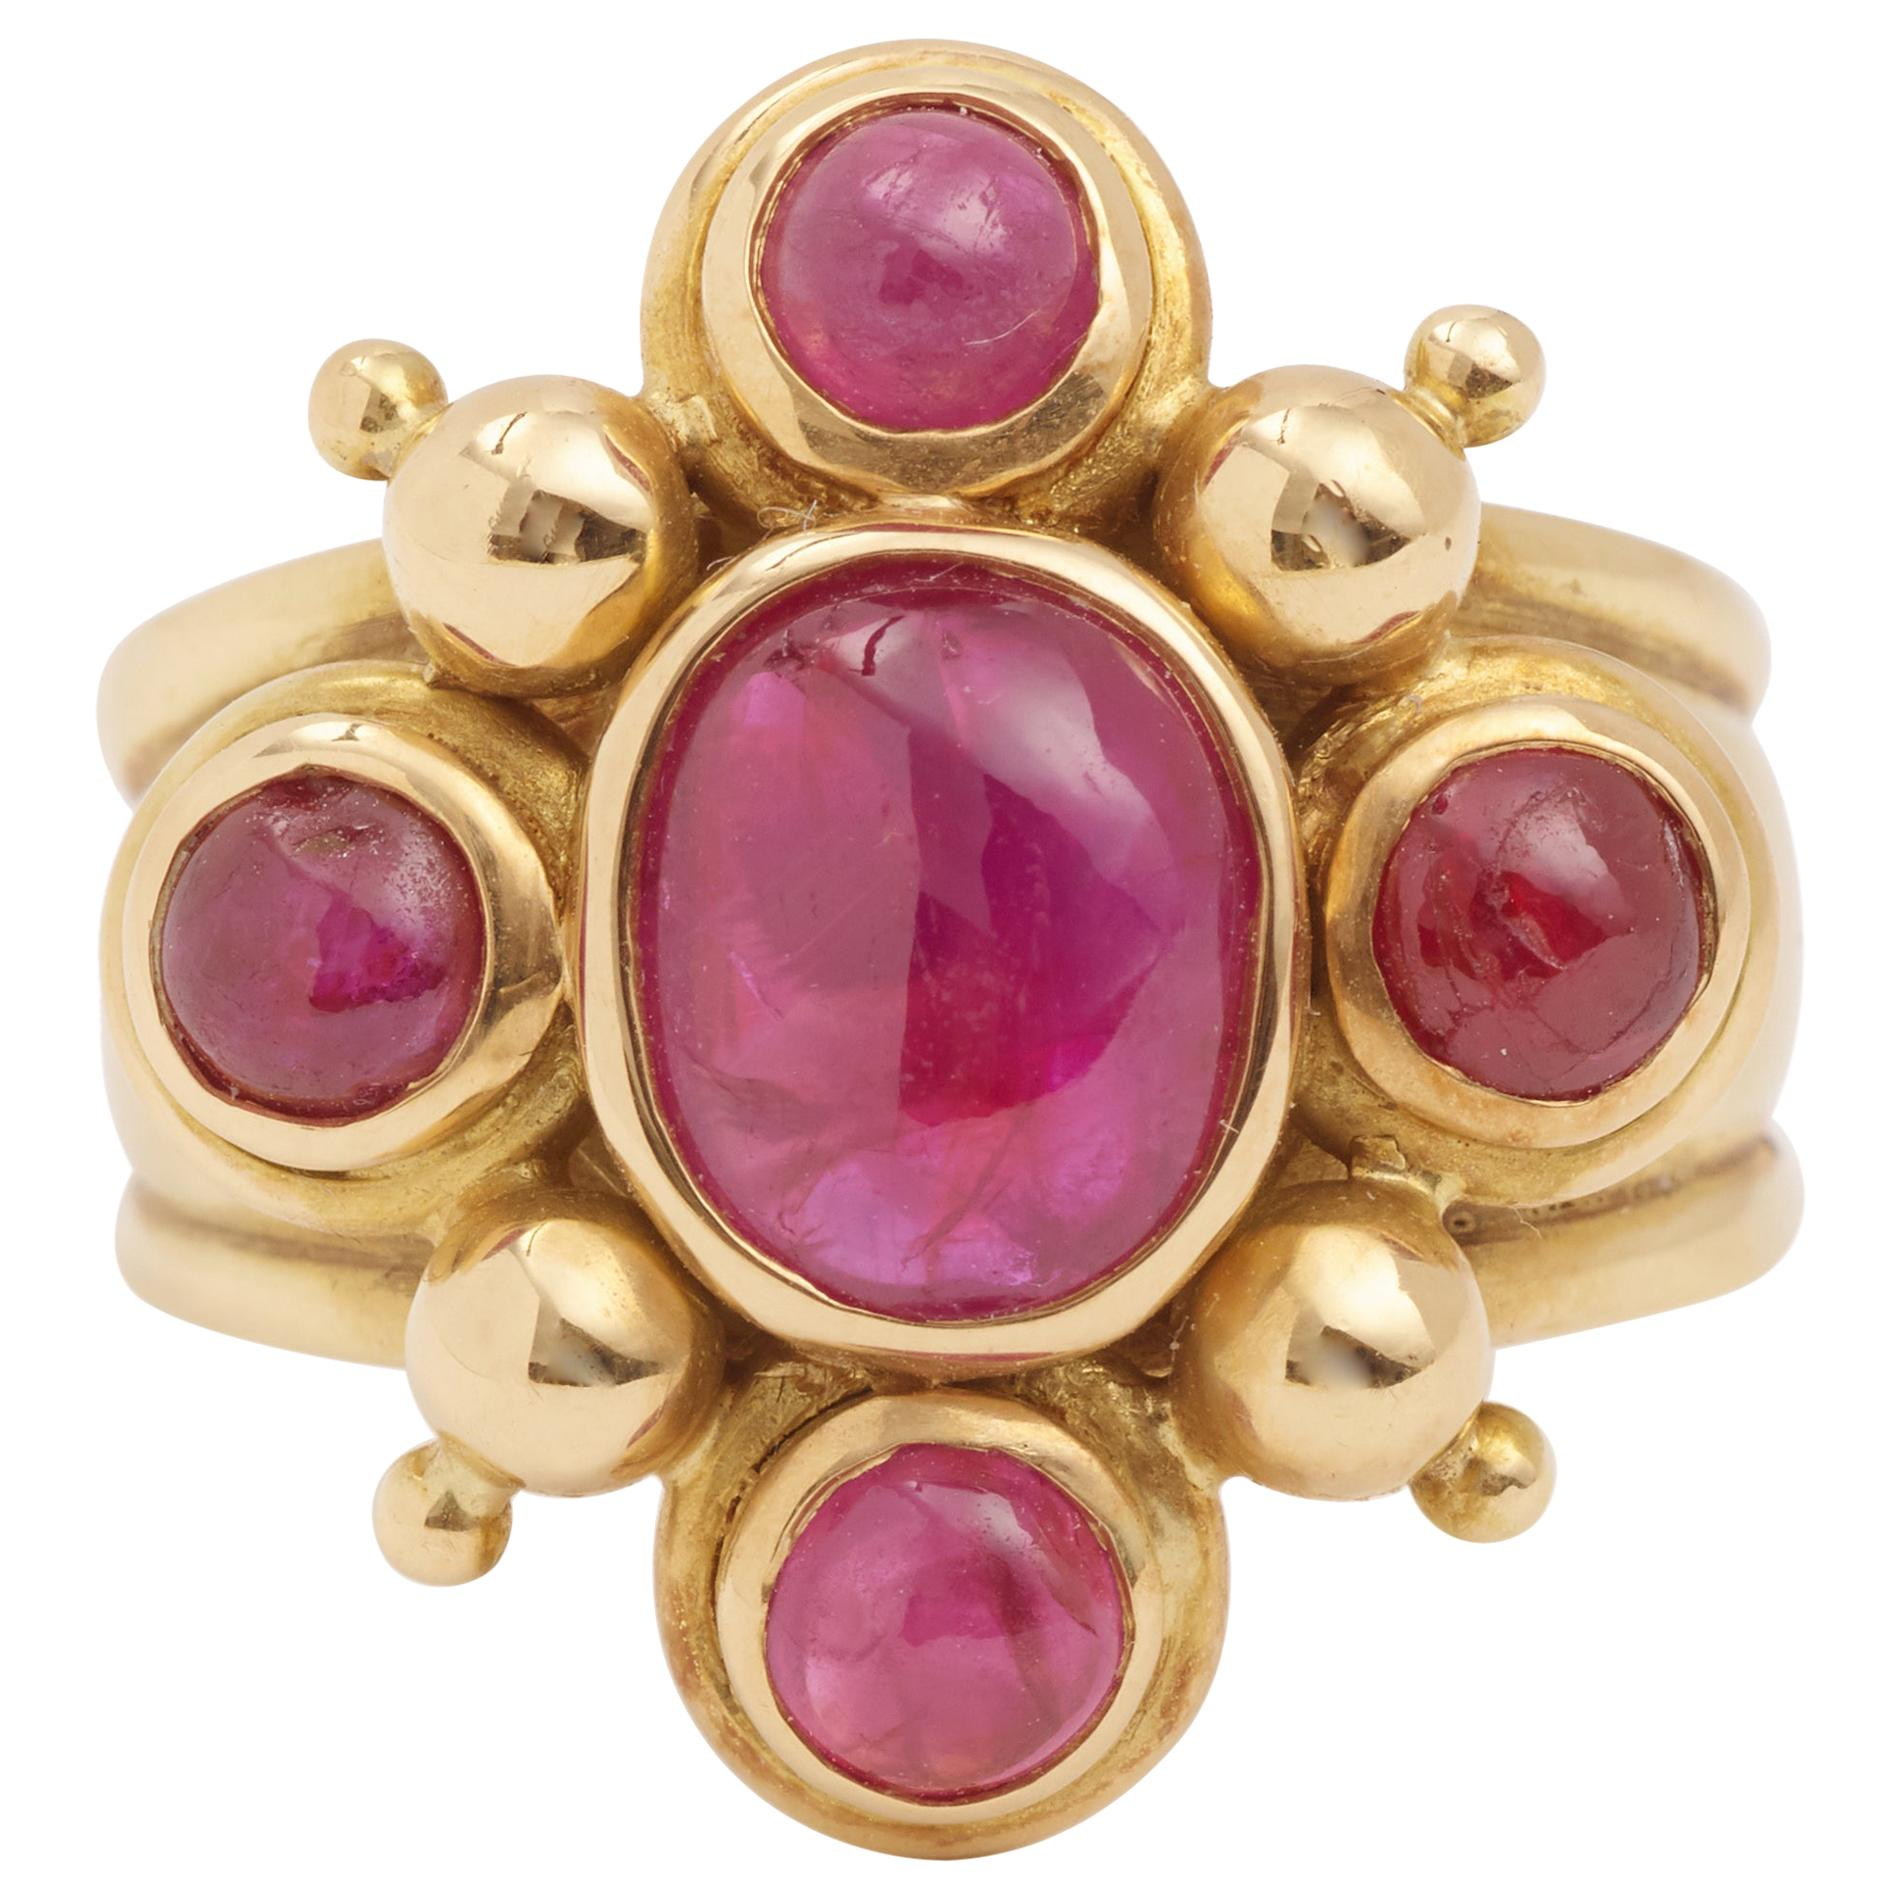 2 Carat Cabochon Rubies 18 Carat Yellow Gold Ring